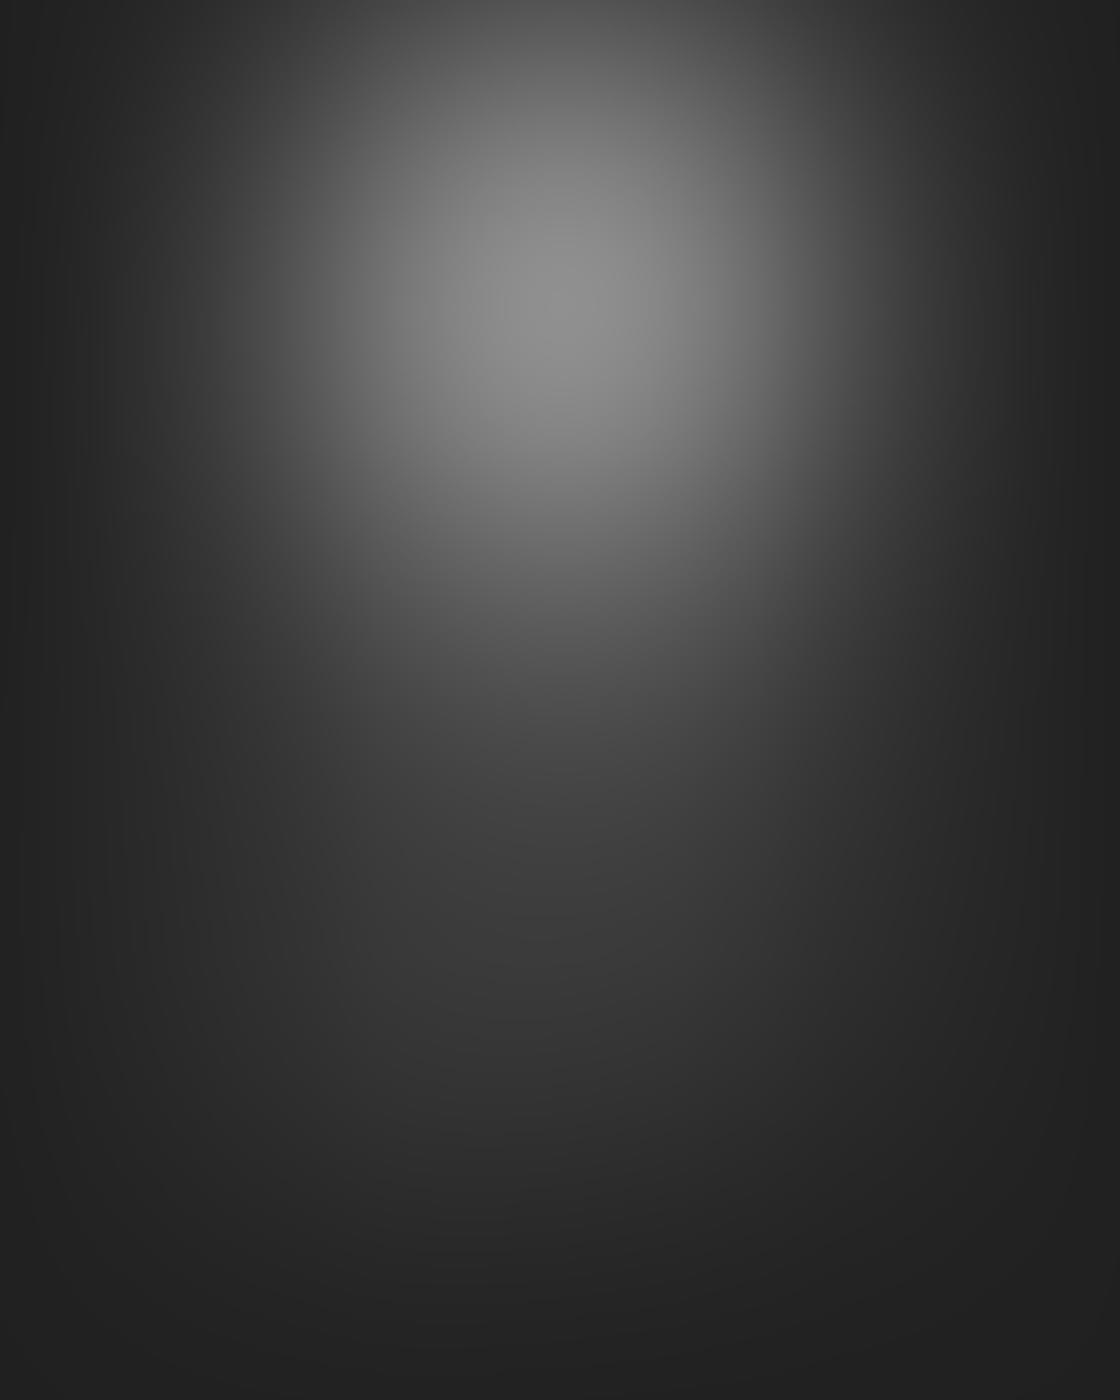 Black & White iPhone Portrait Photos 8